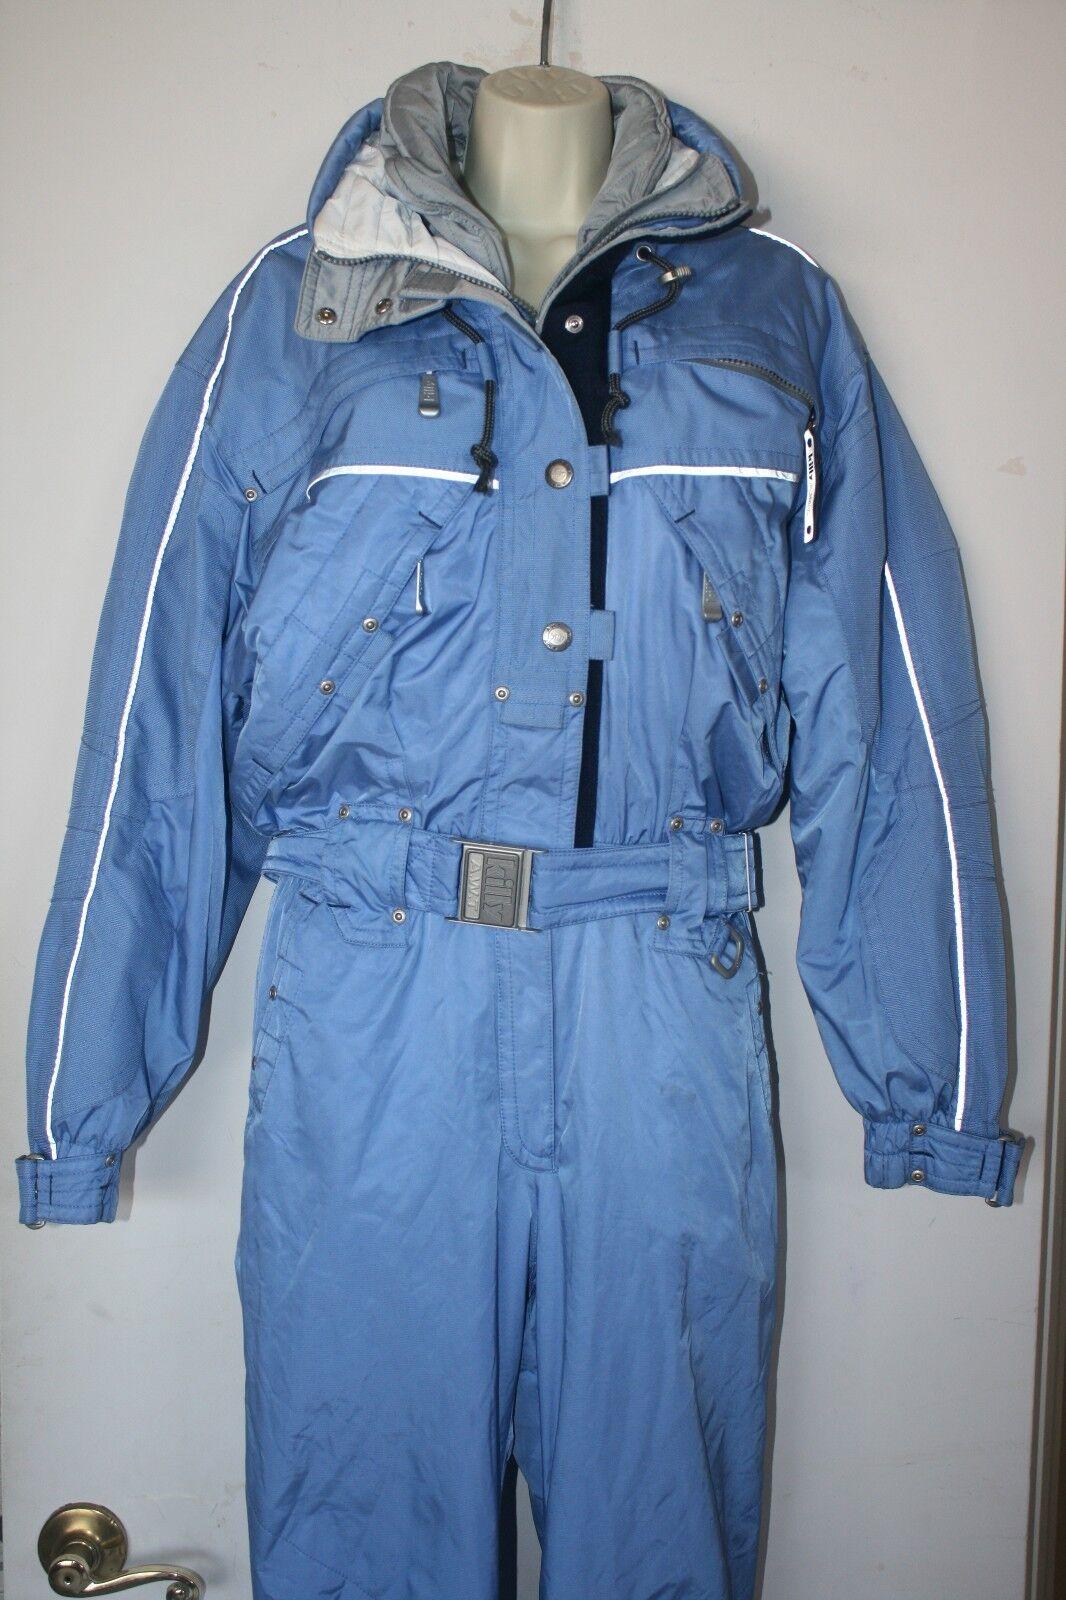 KILLY Master Tech Equip A.W.T. RECCO Full Body Ski Suit Sz F36 D34  I40 GB 32/8